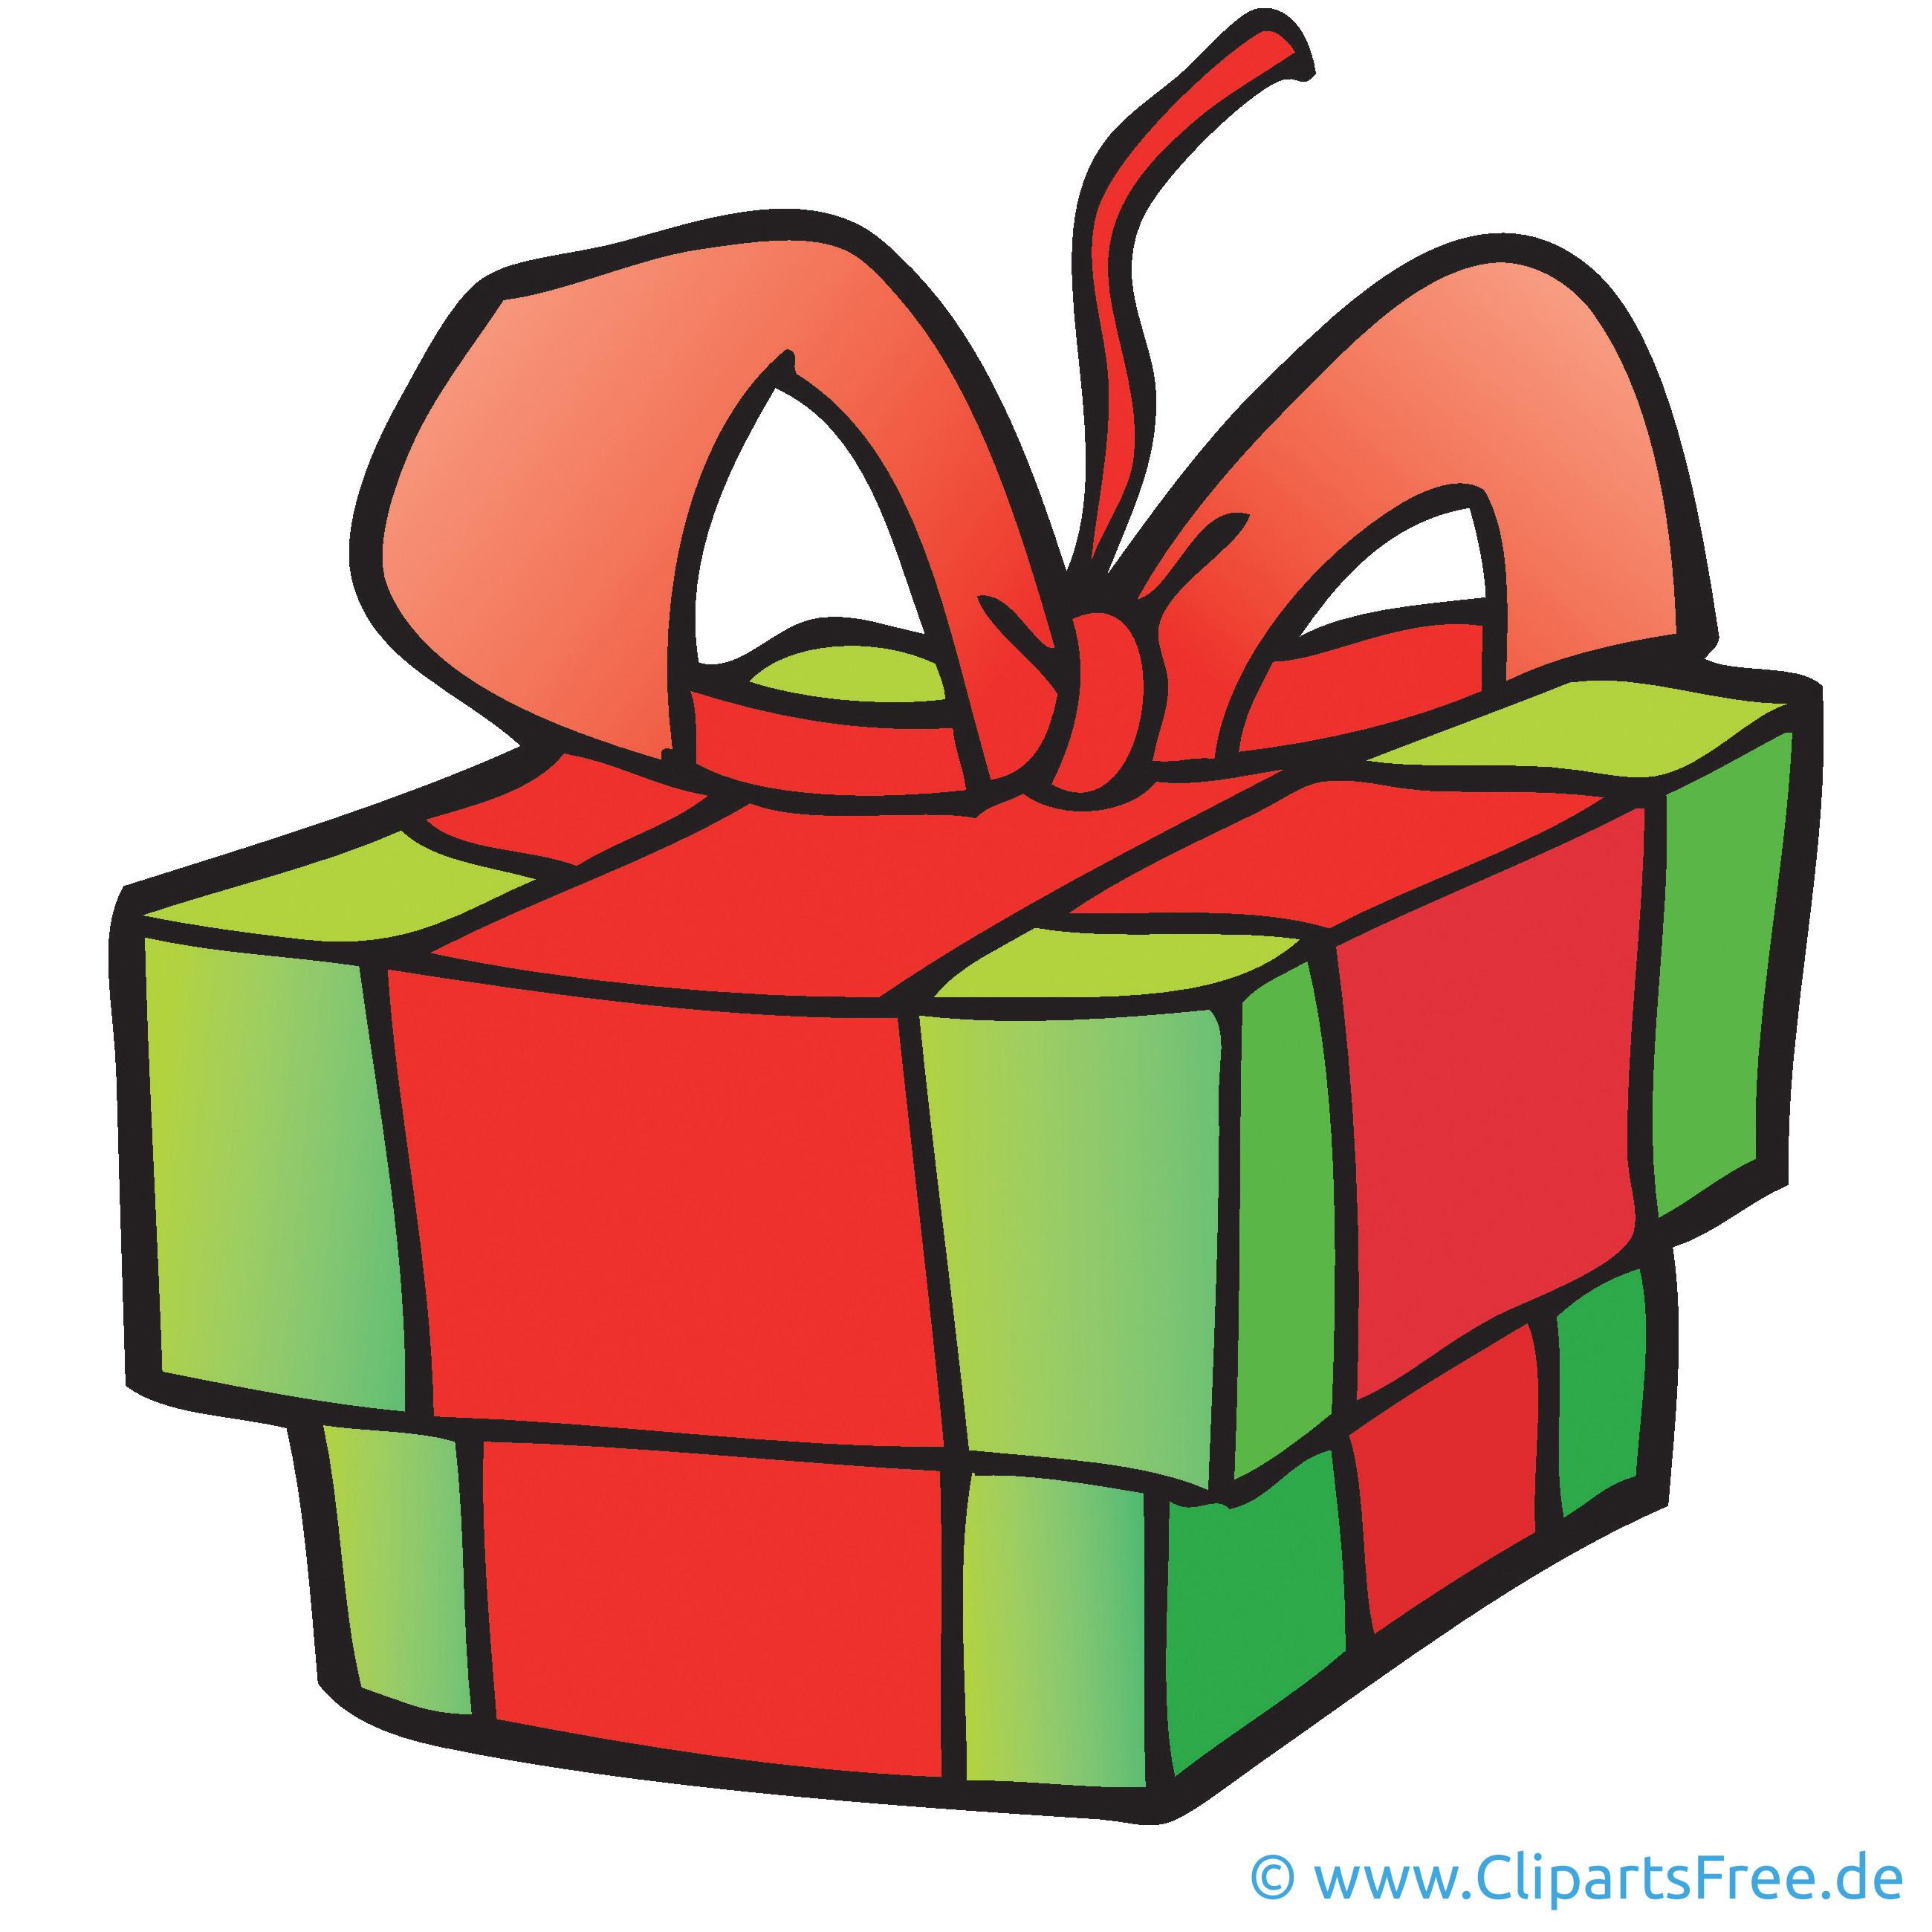 Gratis Geschenke  Geschenk Clipart Bild Cartoon Grafik Illustration